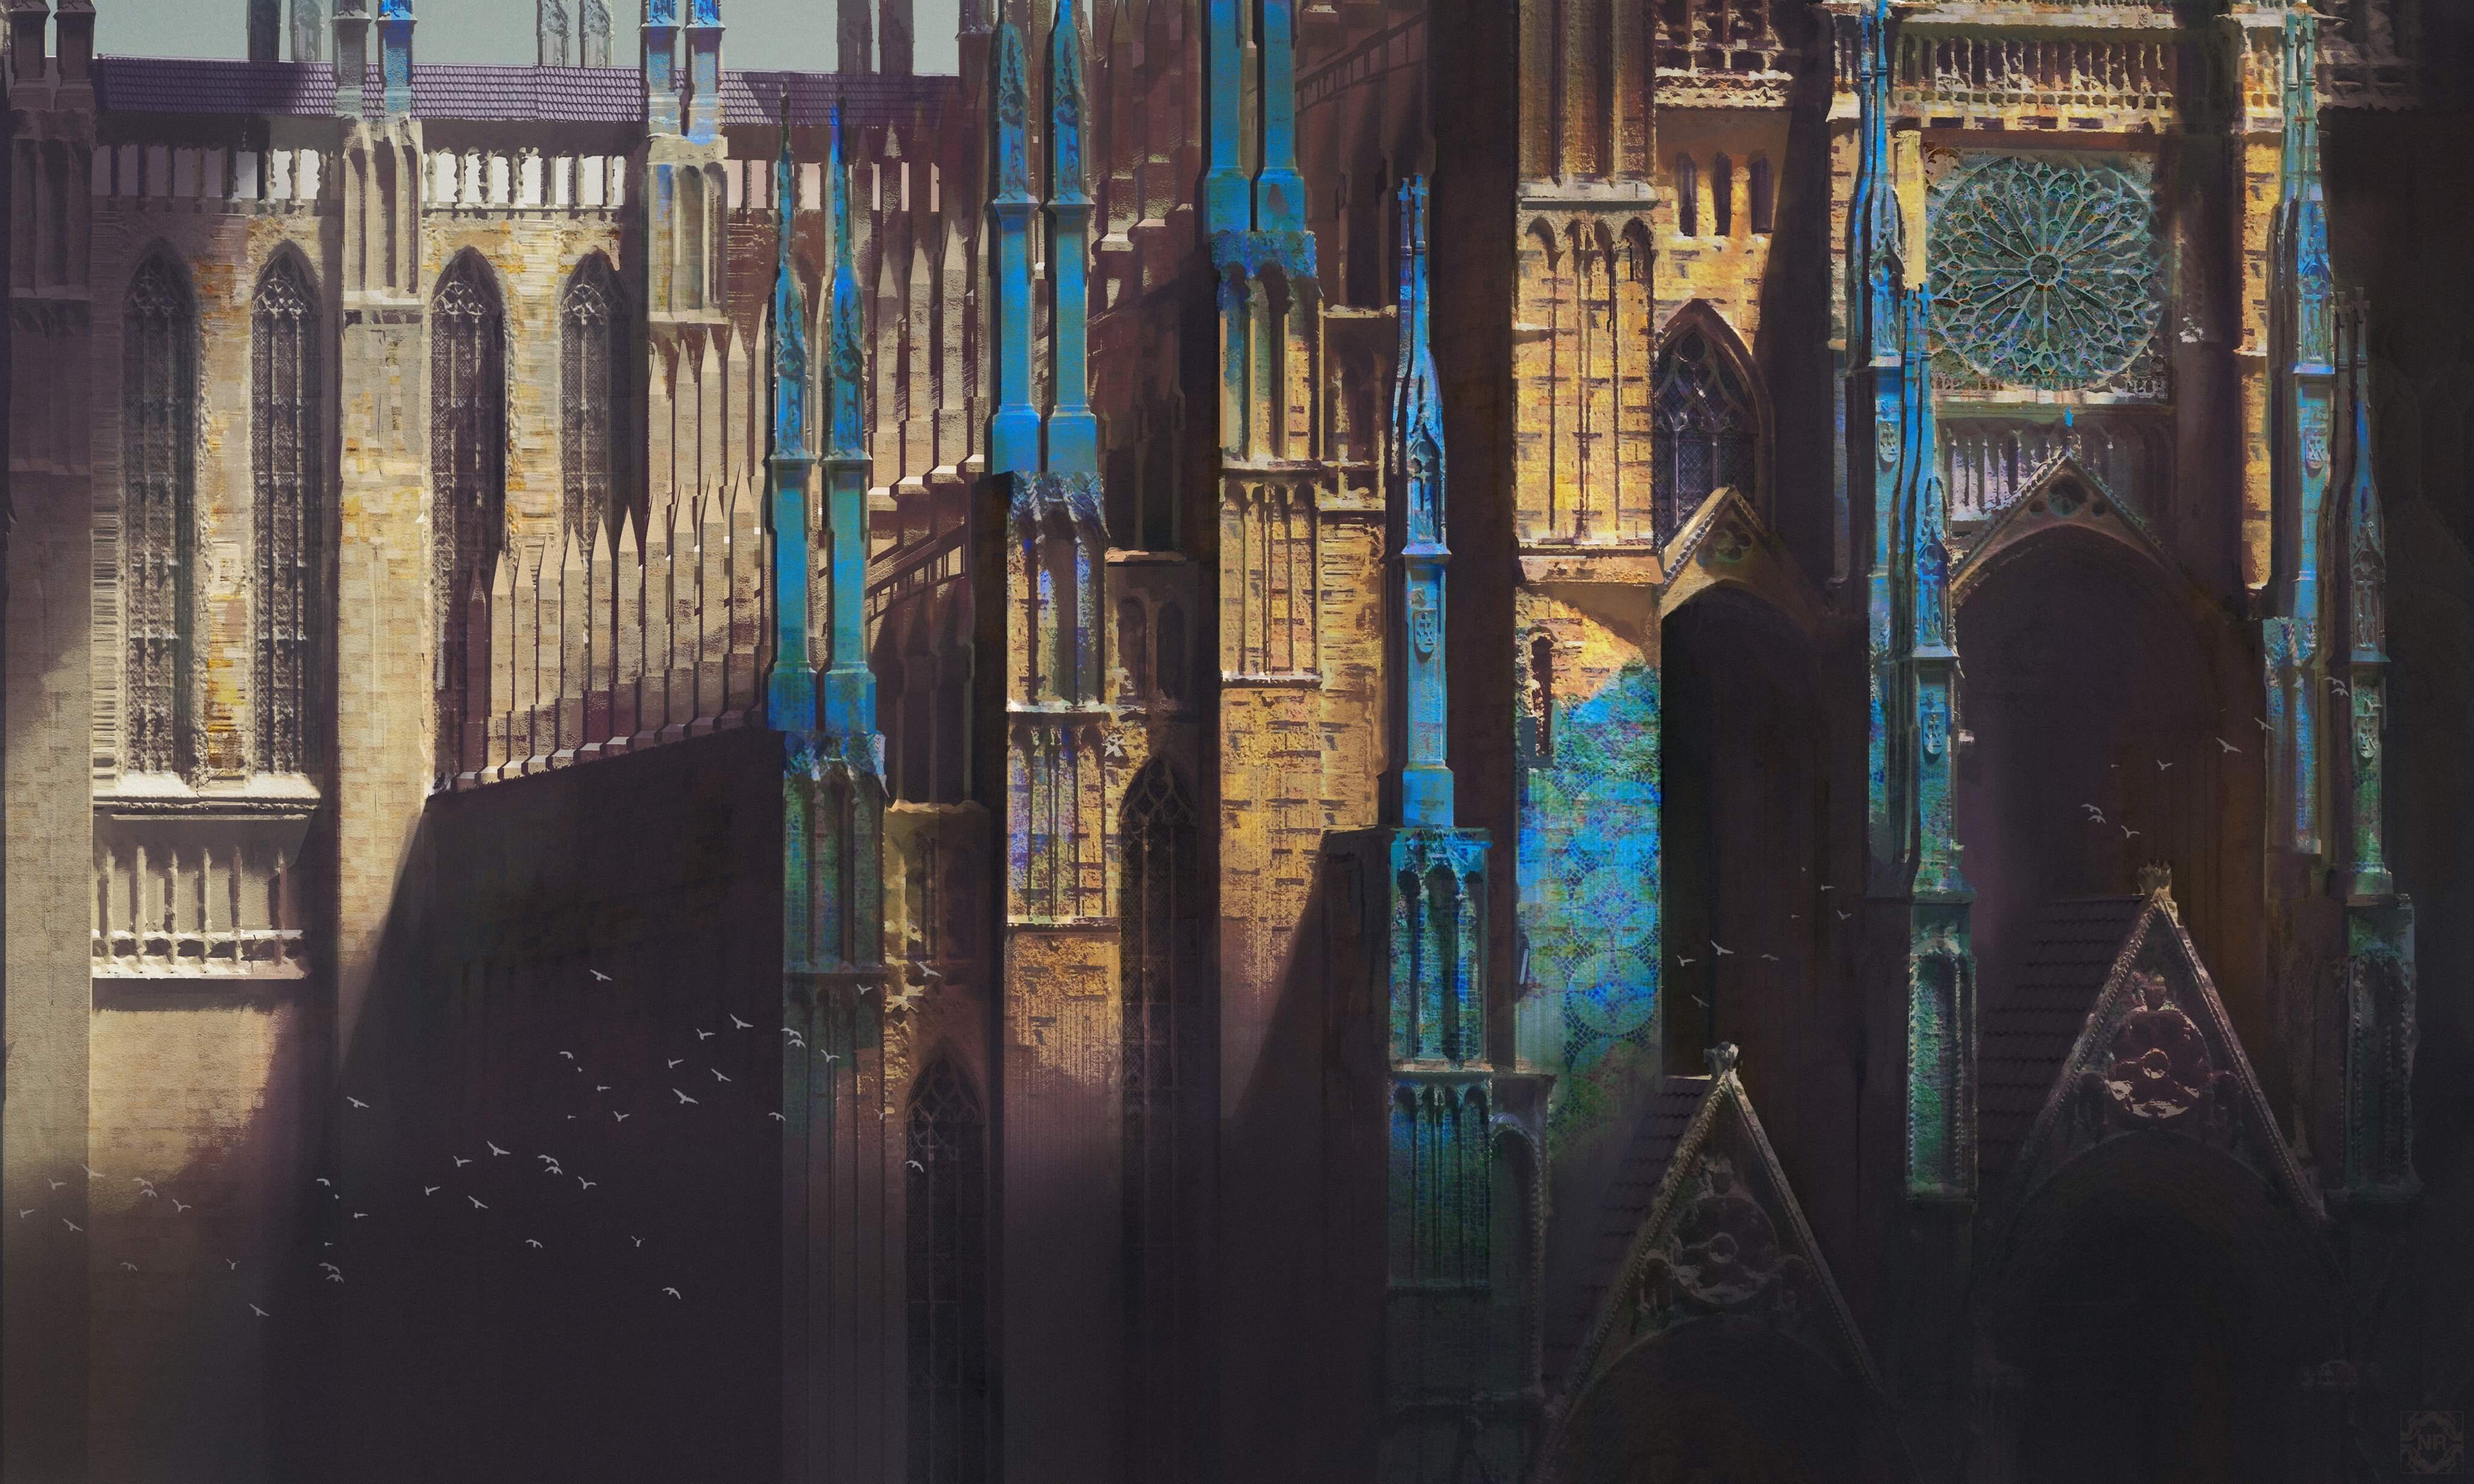 General 3840x2304 artwork digital art castle fantasy architecture cathedral fantasy art